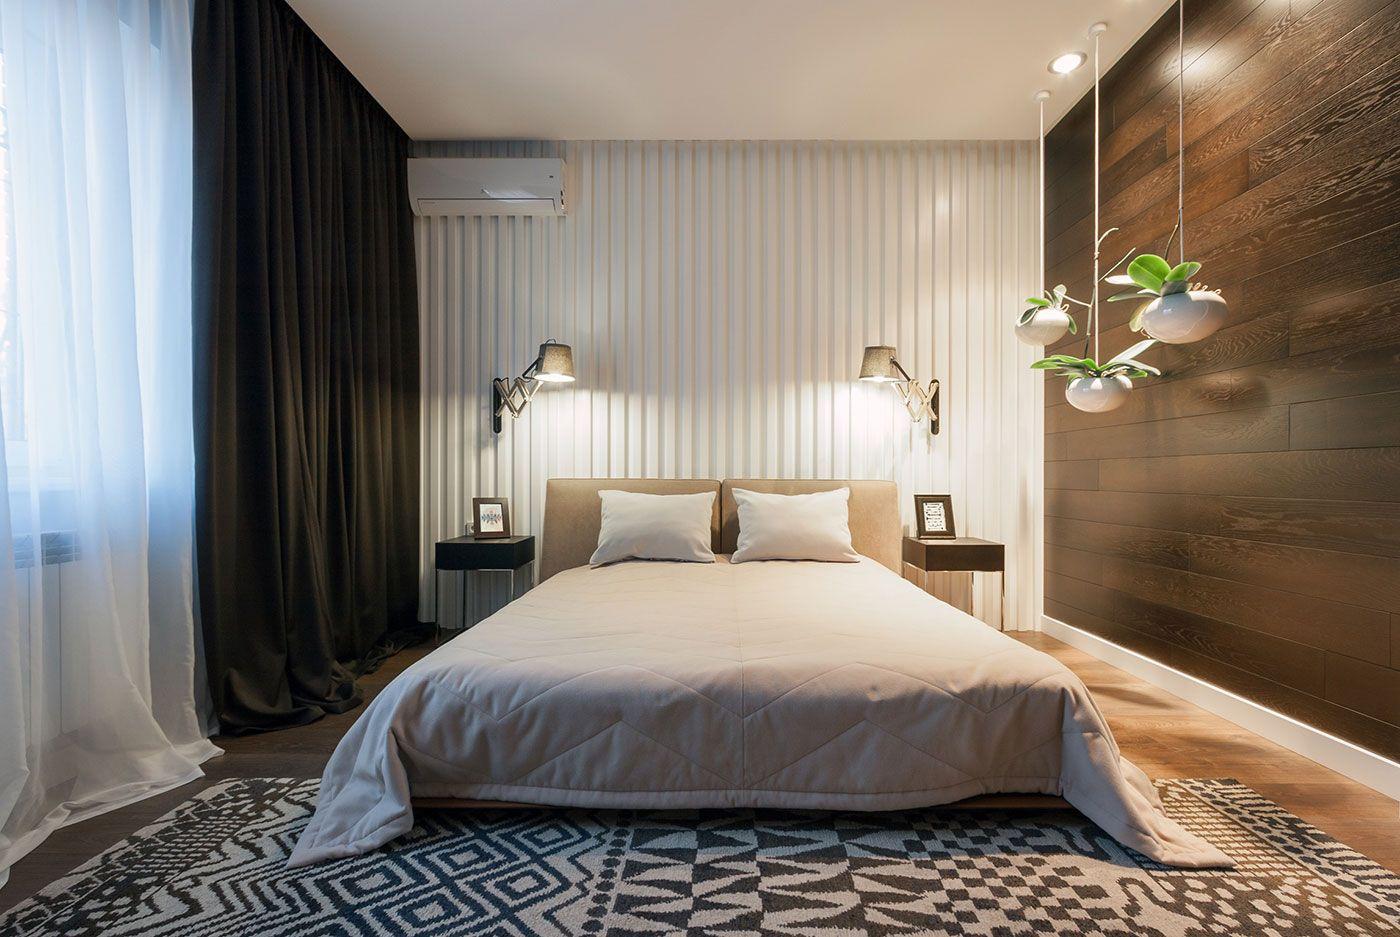 conception de chambre confortable